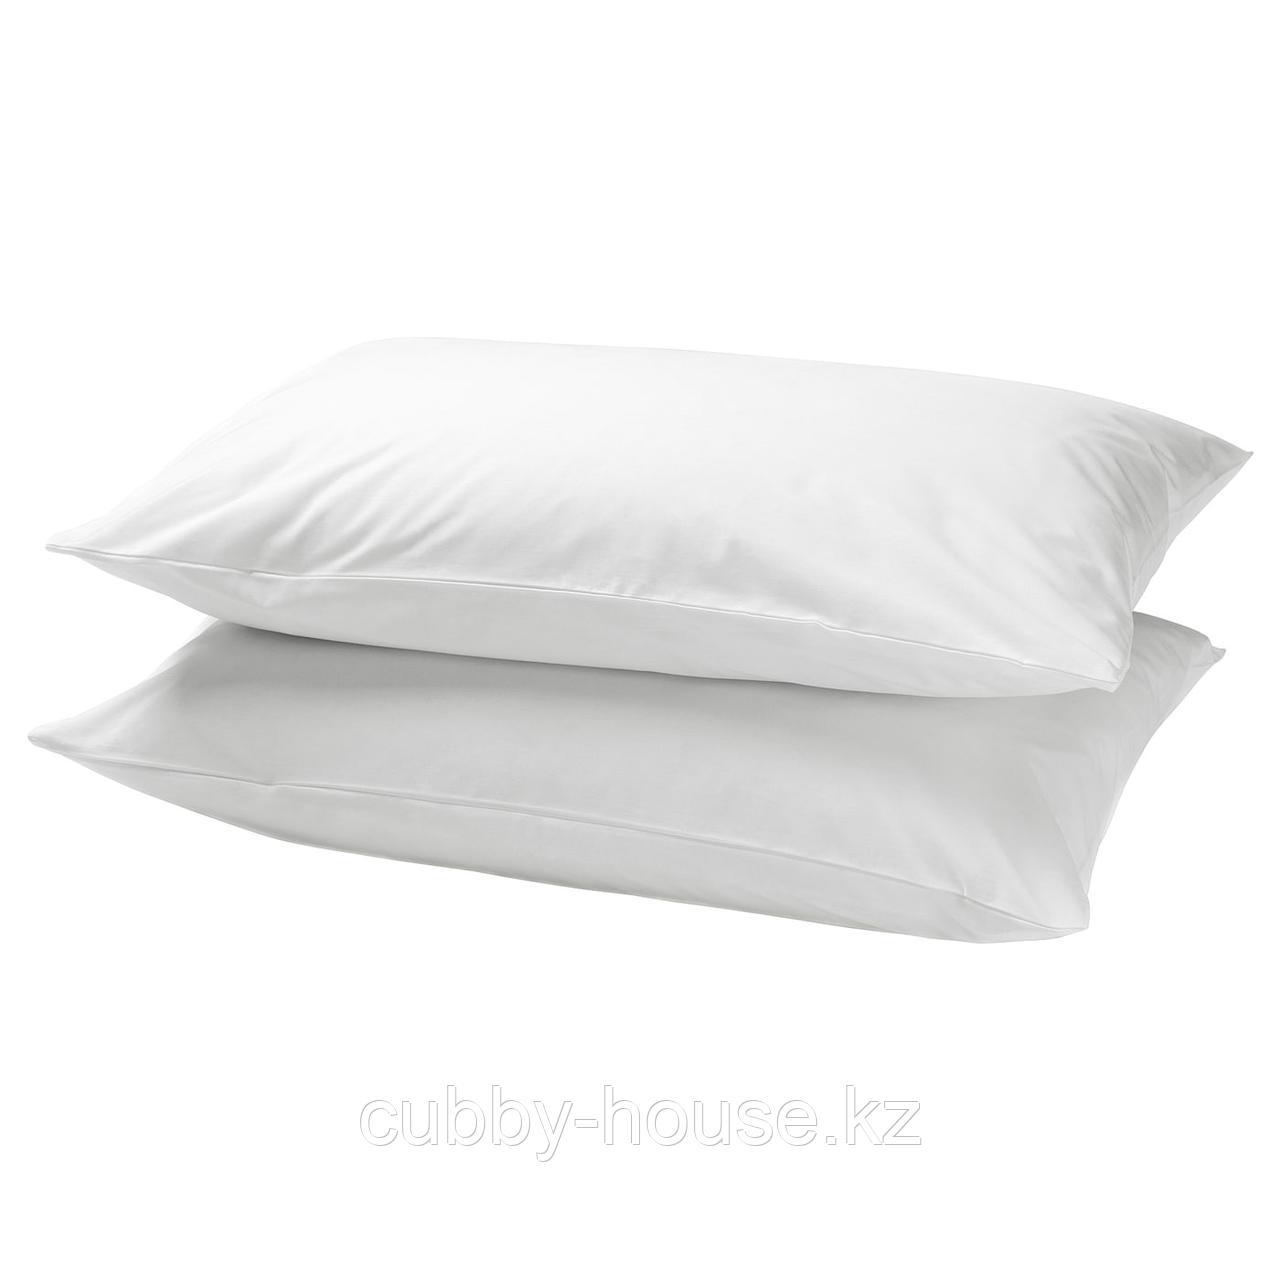 ДВАЛА Наволочка, белый, 50x70 см